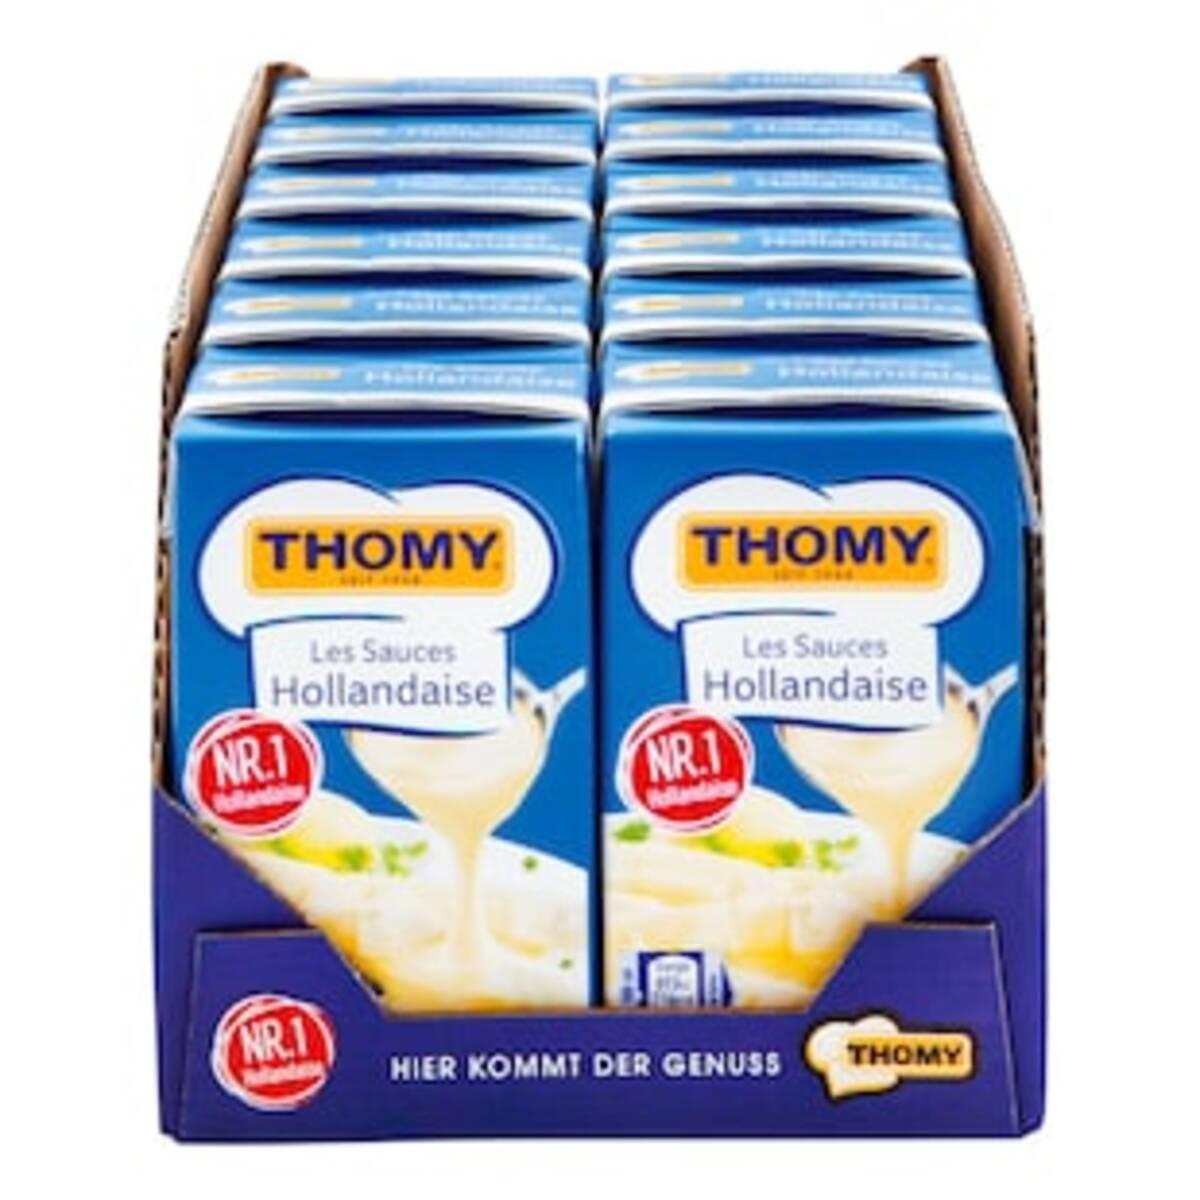 Bild 2 von Thomy Les Sauce Hollandaise 250 ml, 12er Pack